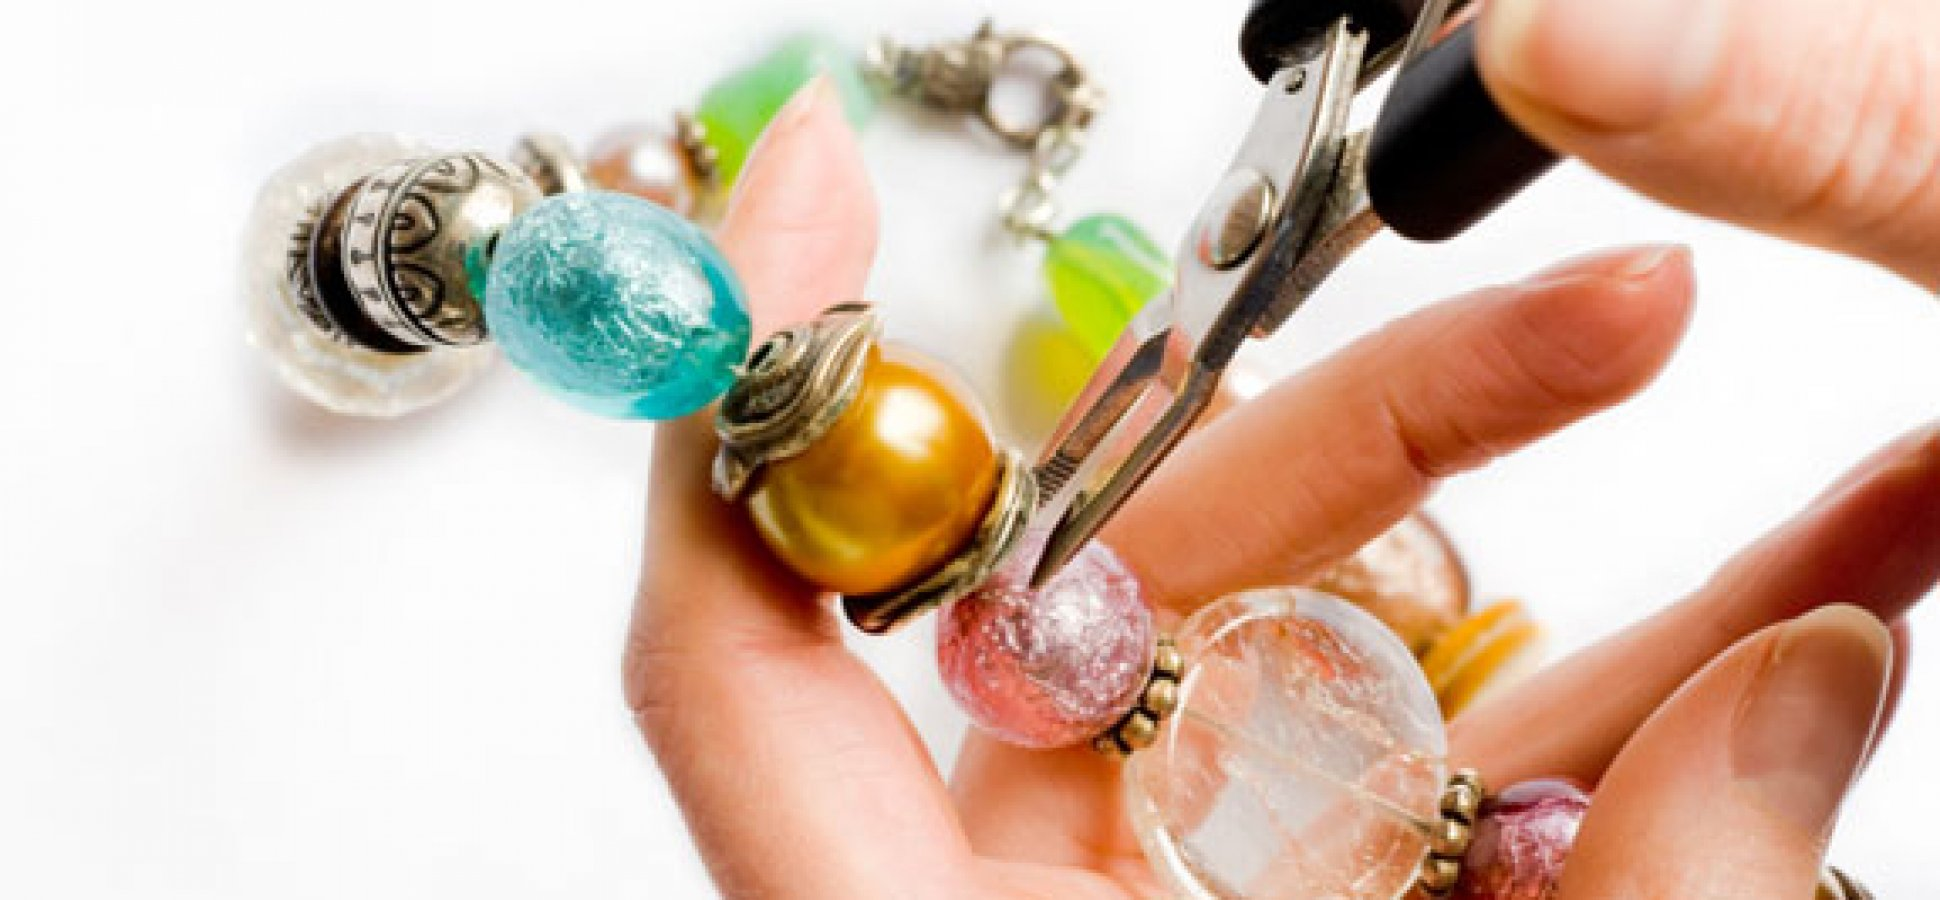 Jewellery Manufacturing & Trade,Tools – Bourj Hamoud